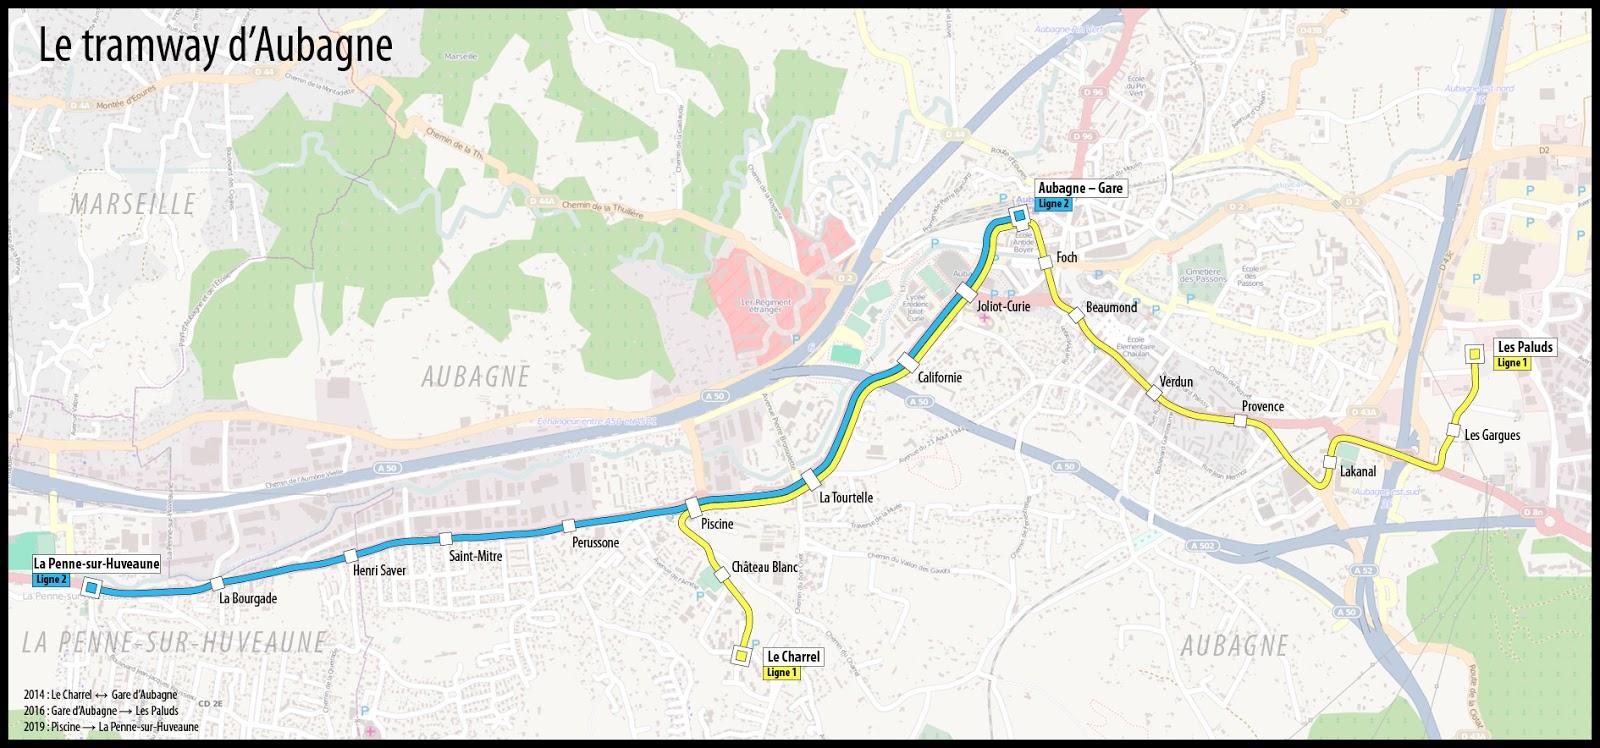 Tram Ridership in France Oil Free Transportation More